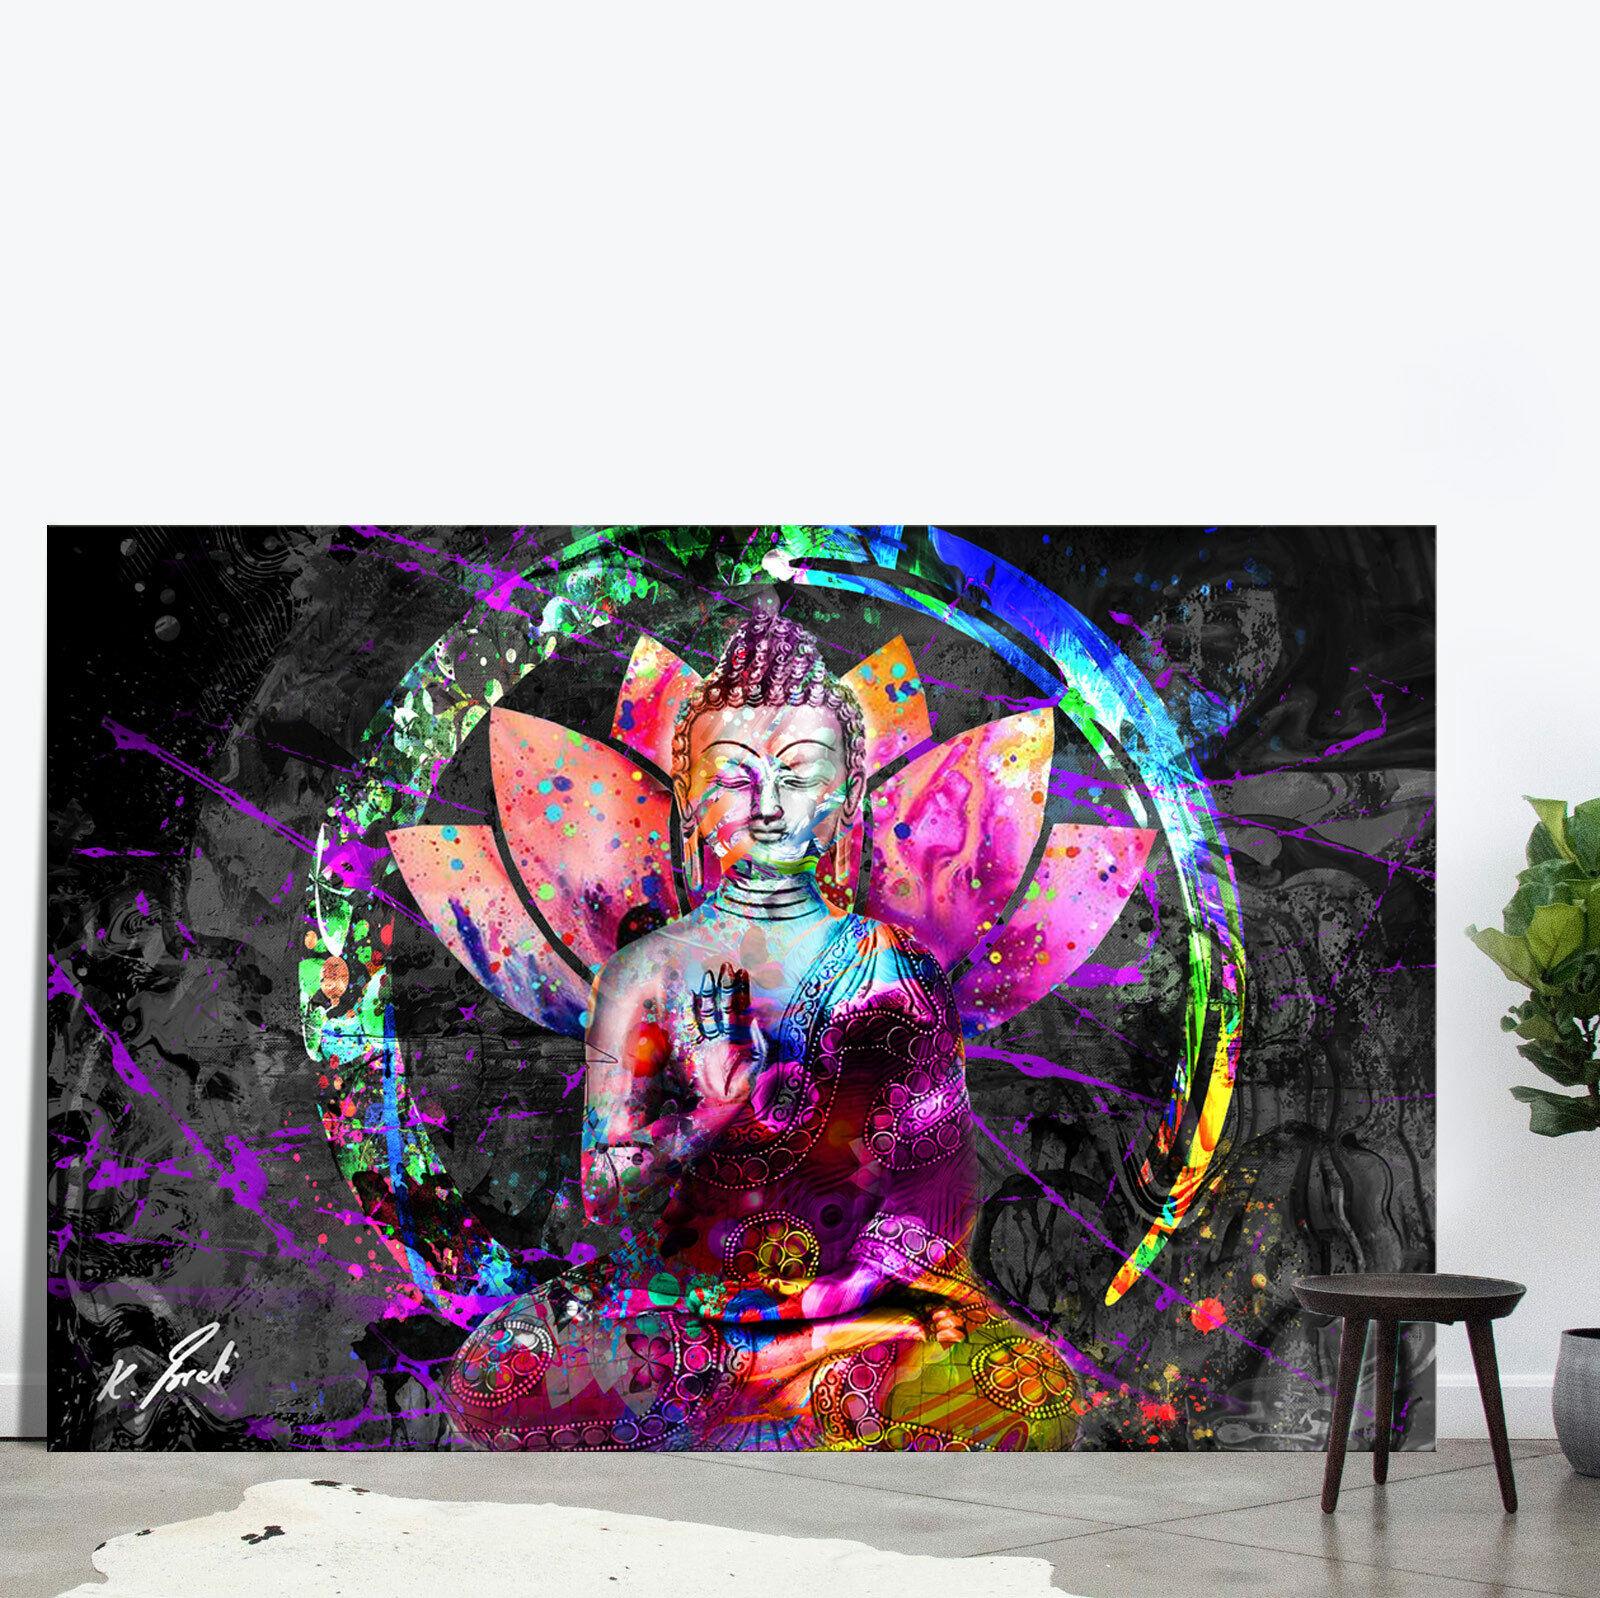 Buddha Bild Bunt Farbe Leinwand Abstrakte Kunst Bilder Wandbilder D2247